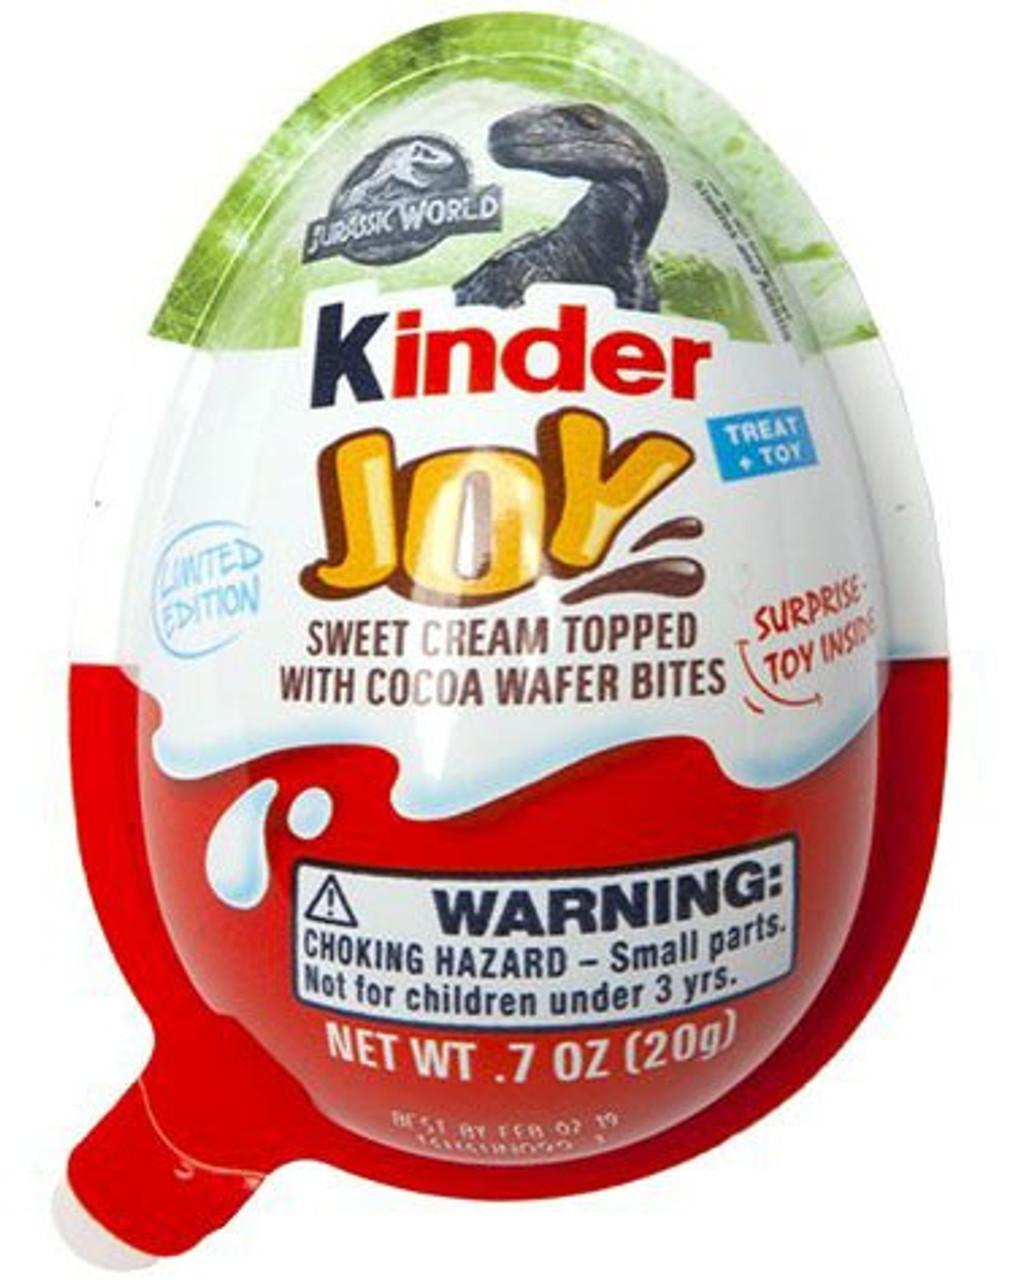 Kinder Joy Jurasic World Mosasaurus Toy Mini Figurine